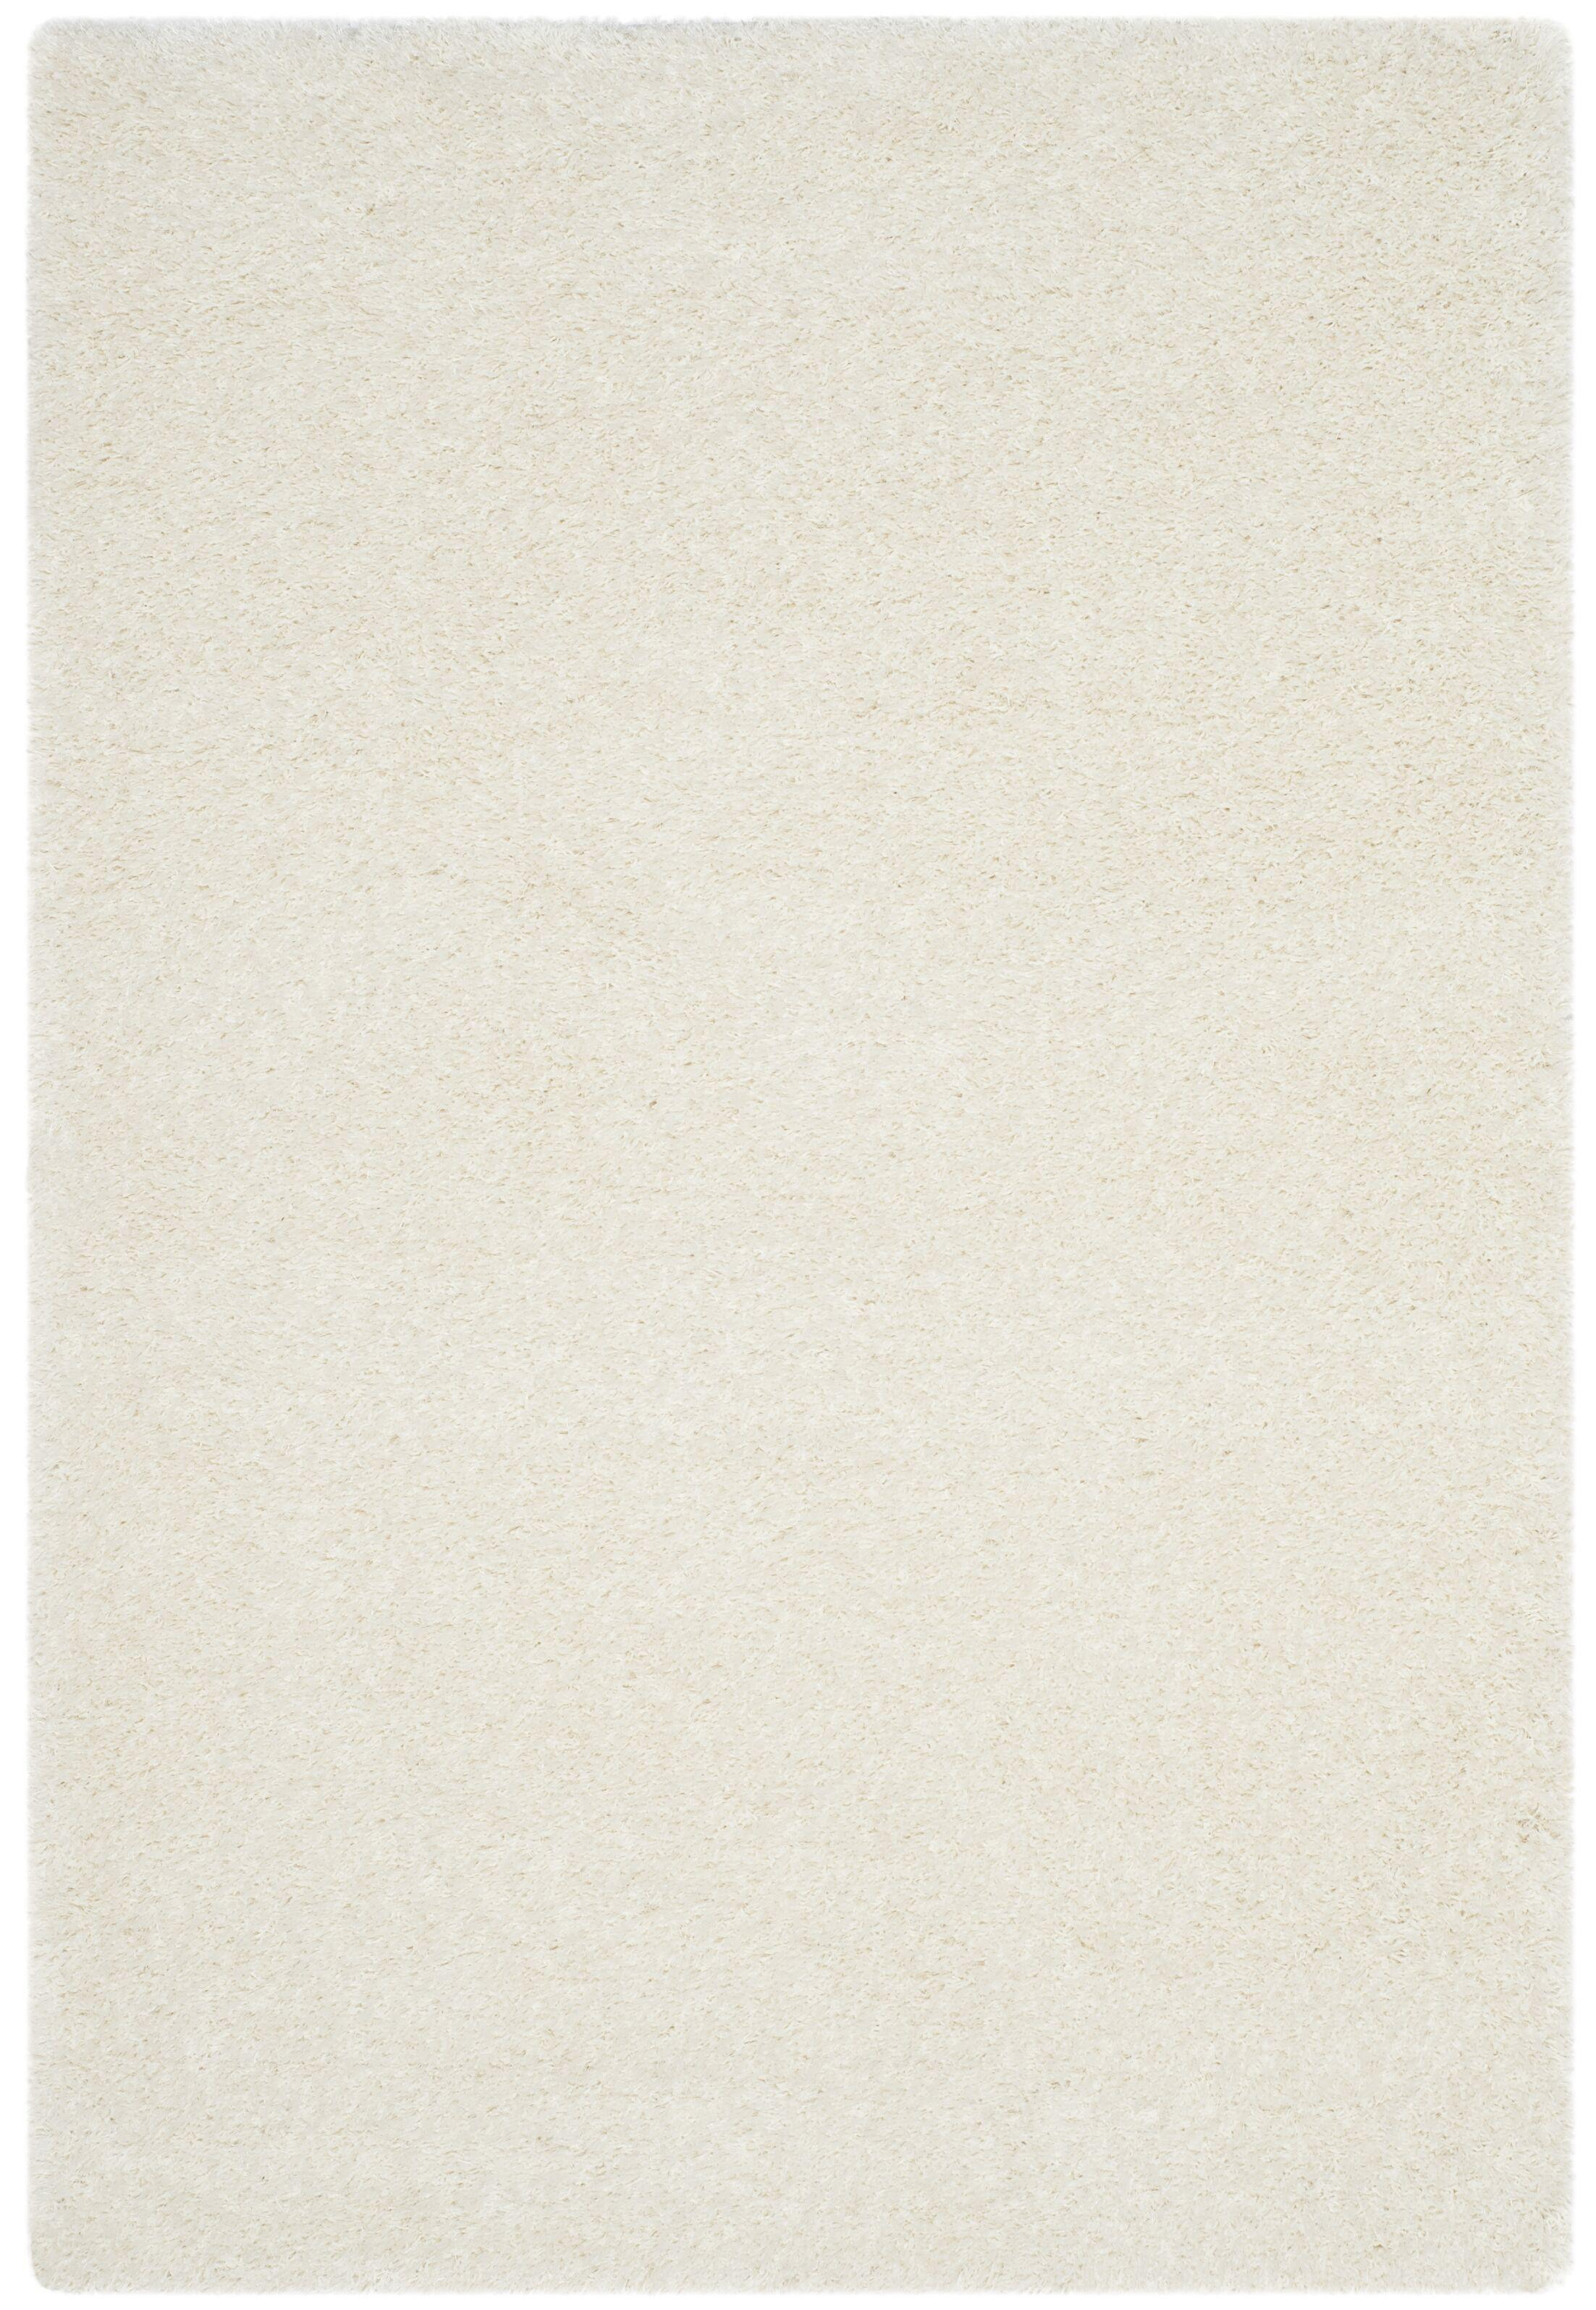 Virgo White Shag Area Rug Rug Size: Rectangle 5'1